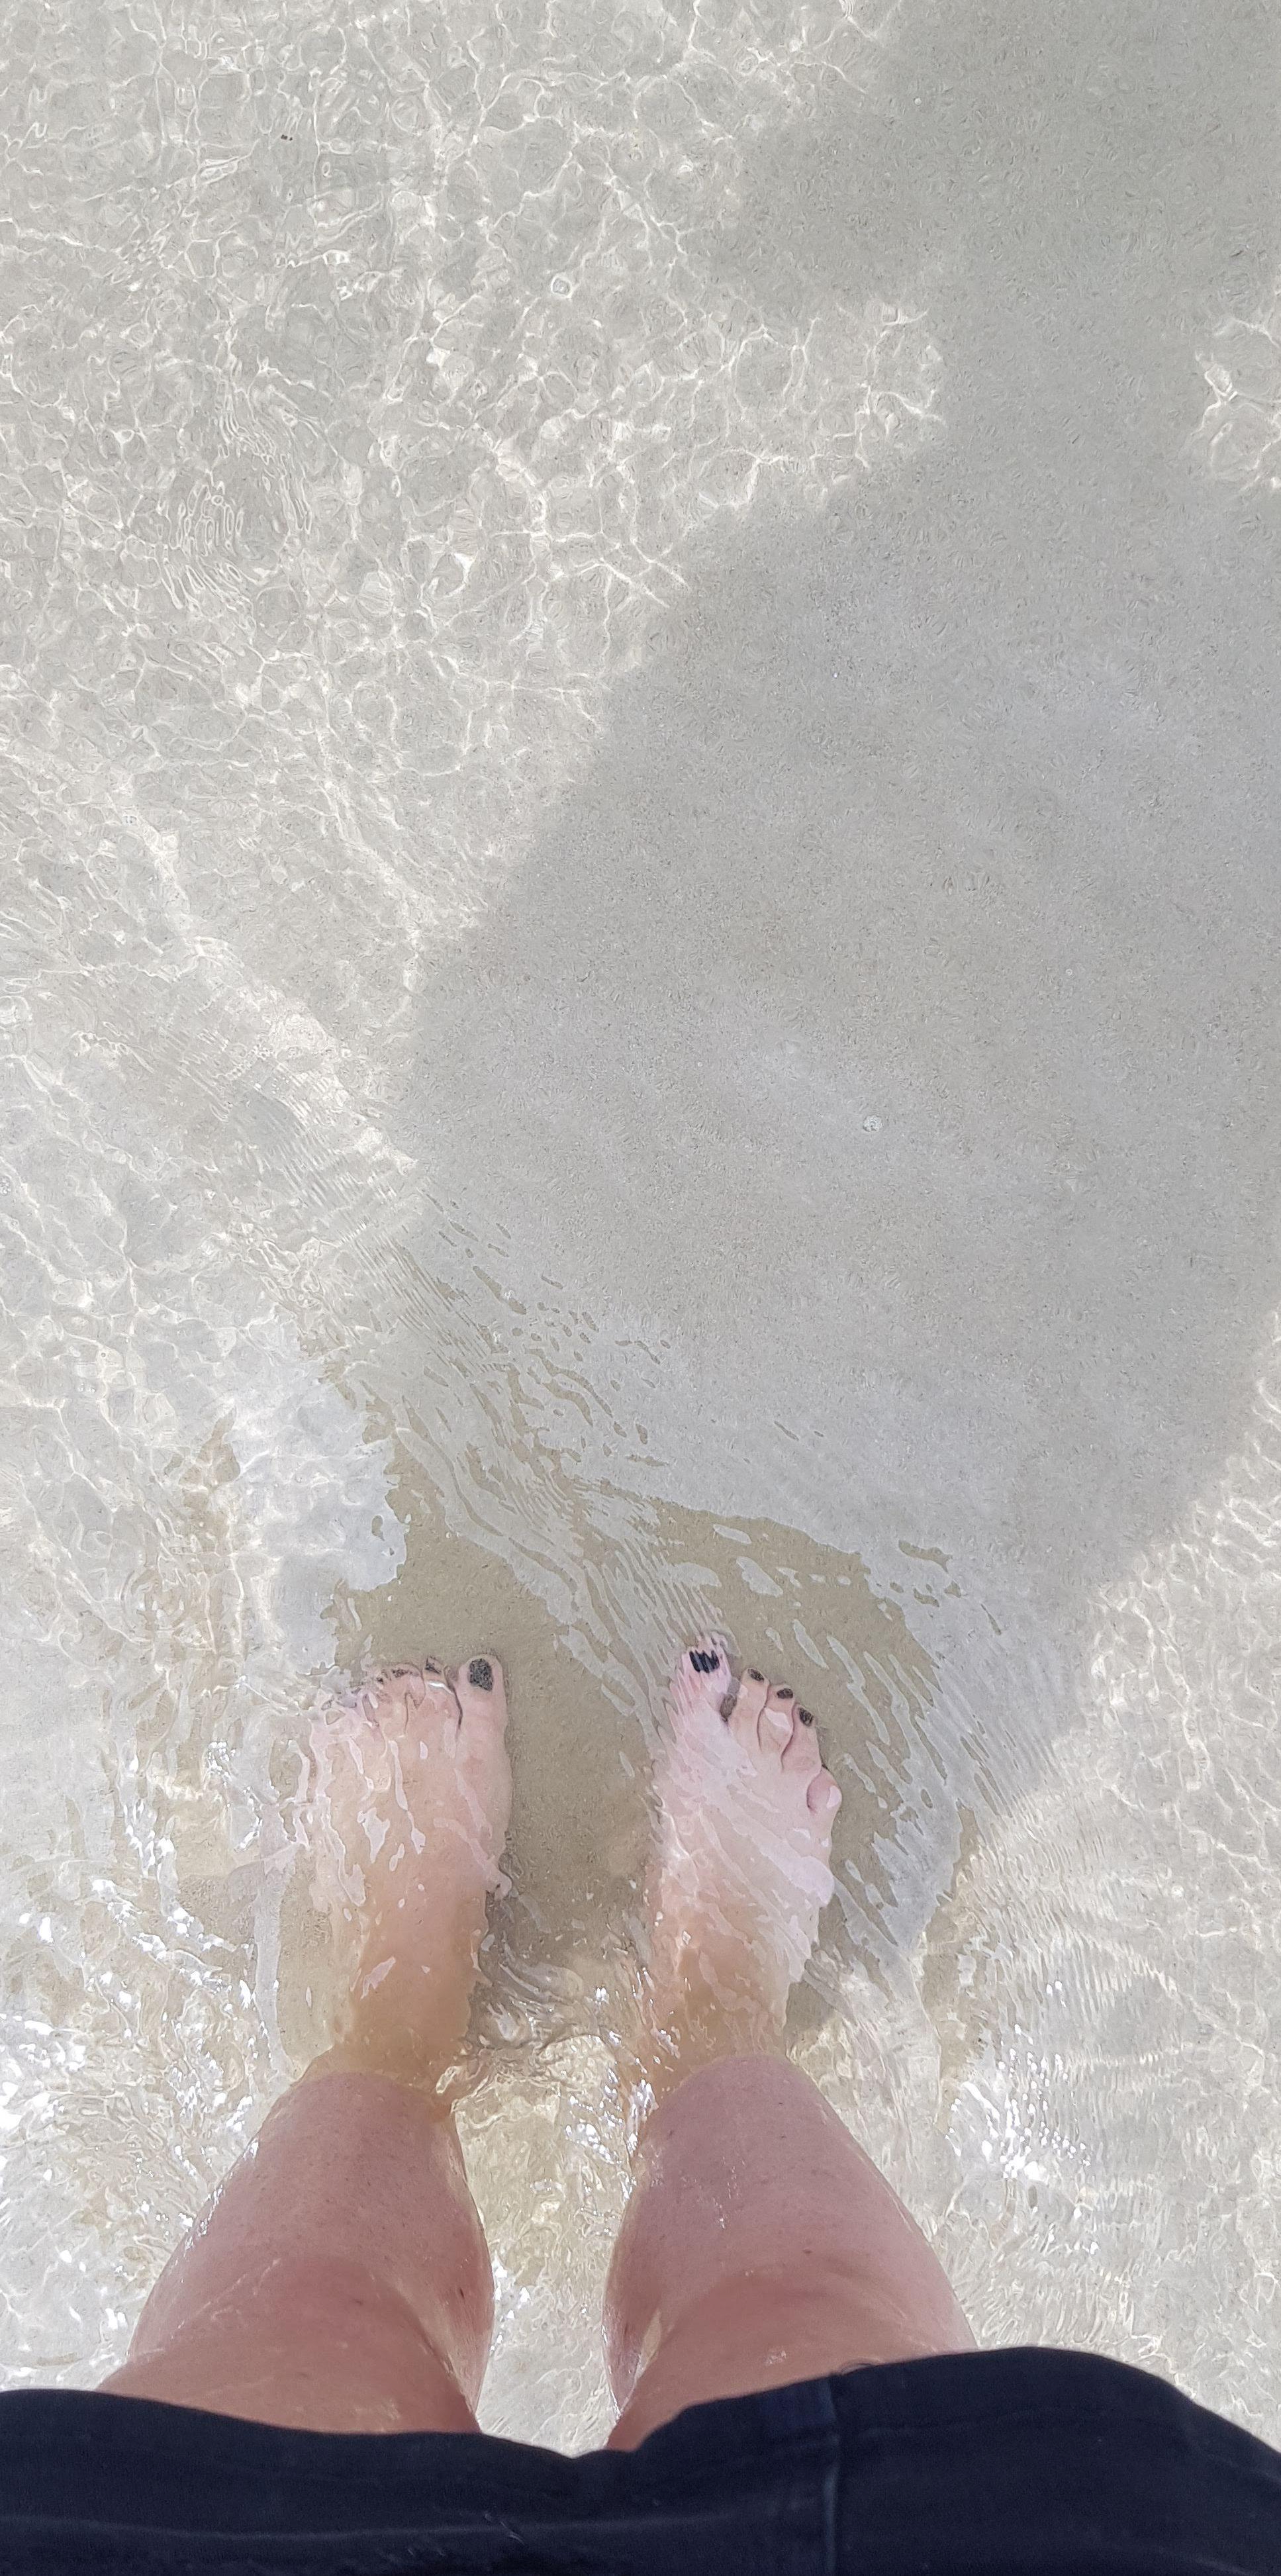 taking care feet self love beauty soul samantha clark waters blog